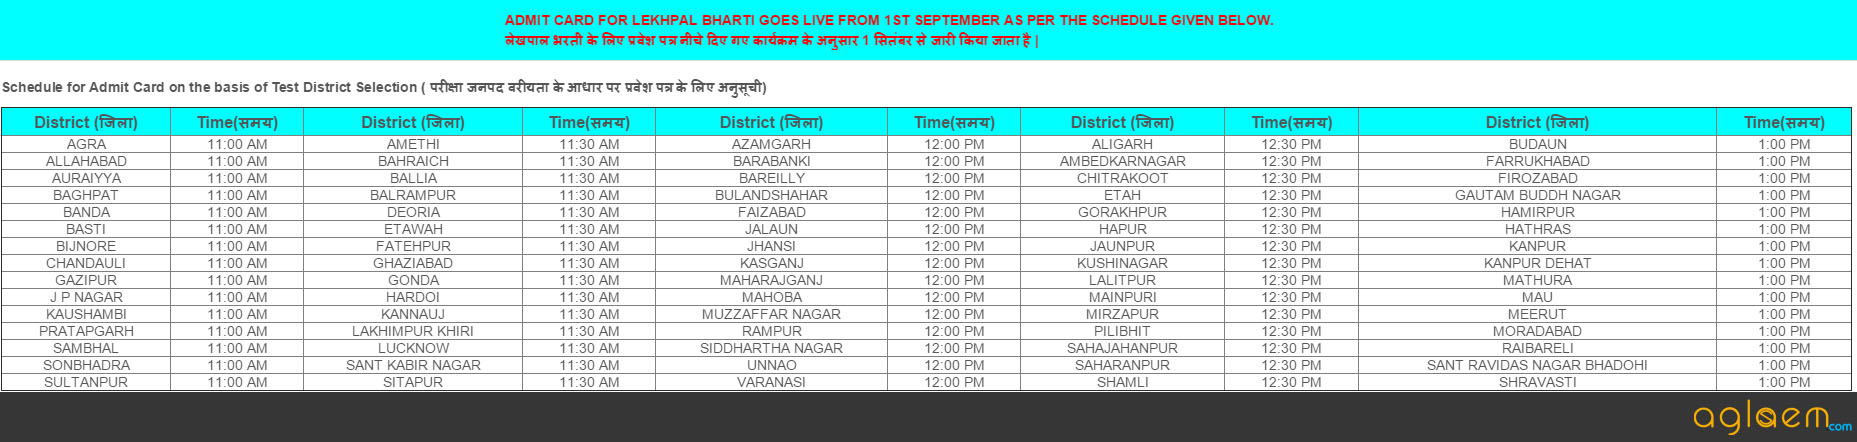 UP Lekhpal Recruitment Admit Card 2015